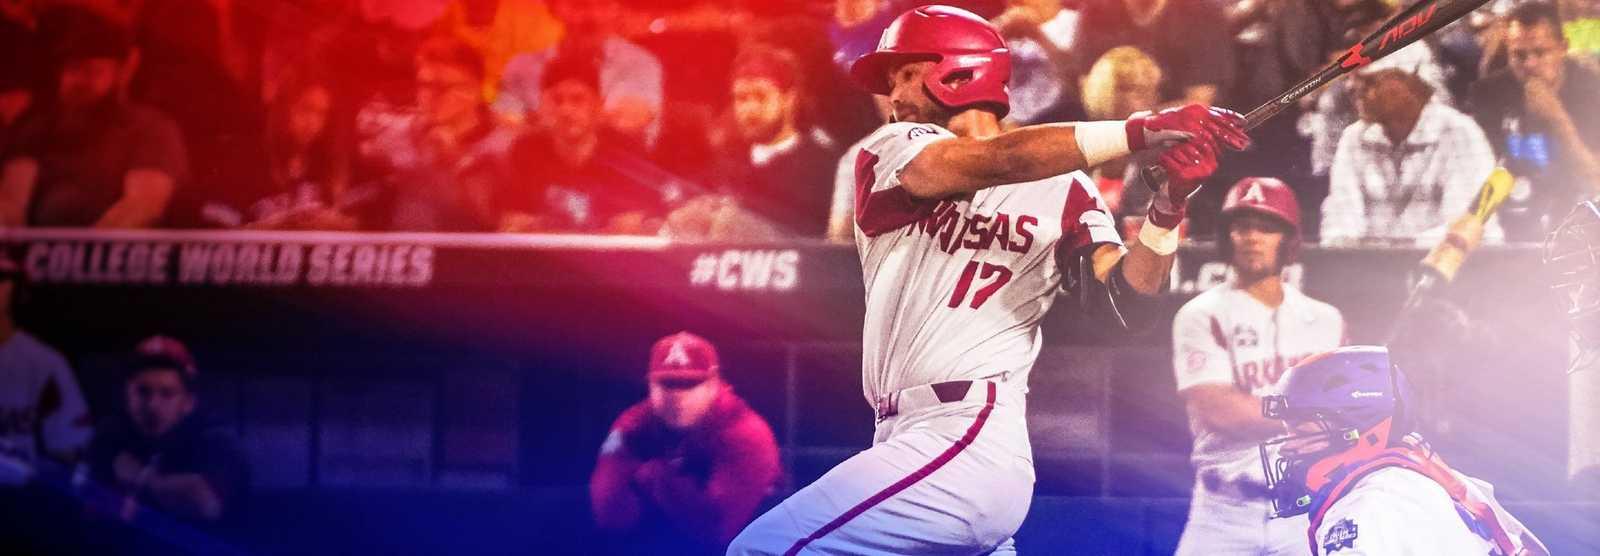 baseball-presidents-day-2019